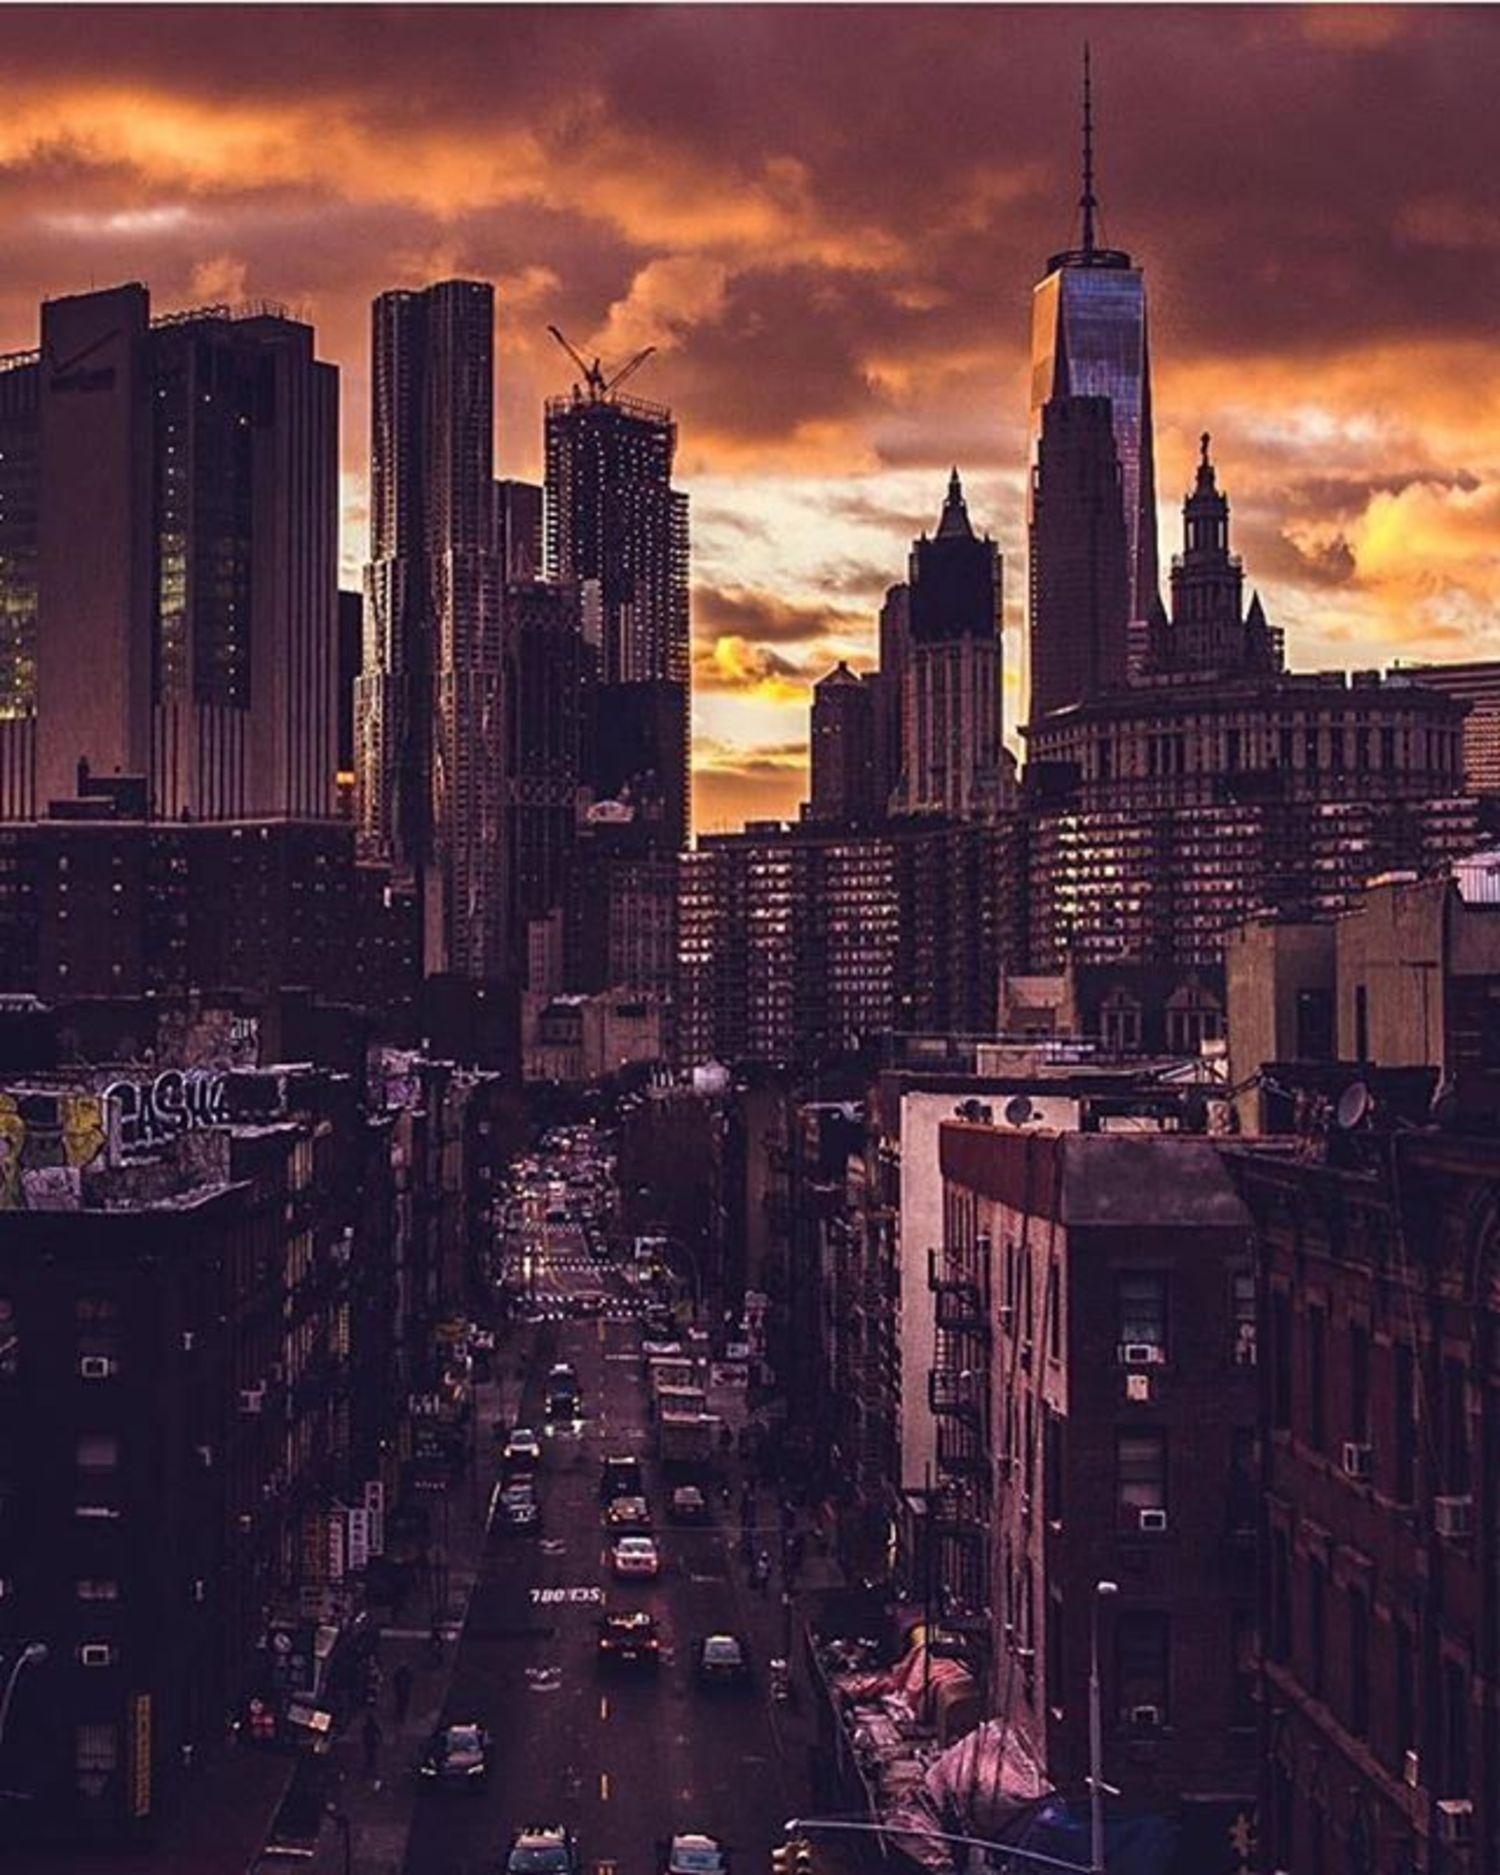 New York, New York. Photo via @scottlipps #viewingnyc